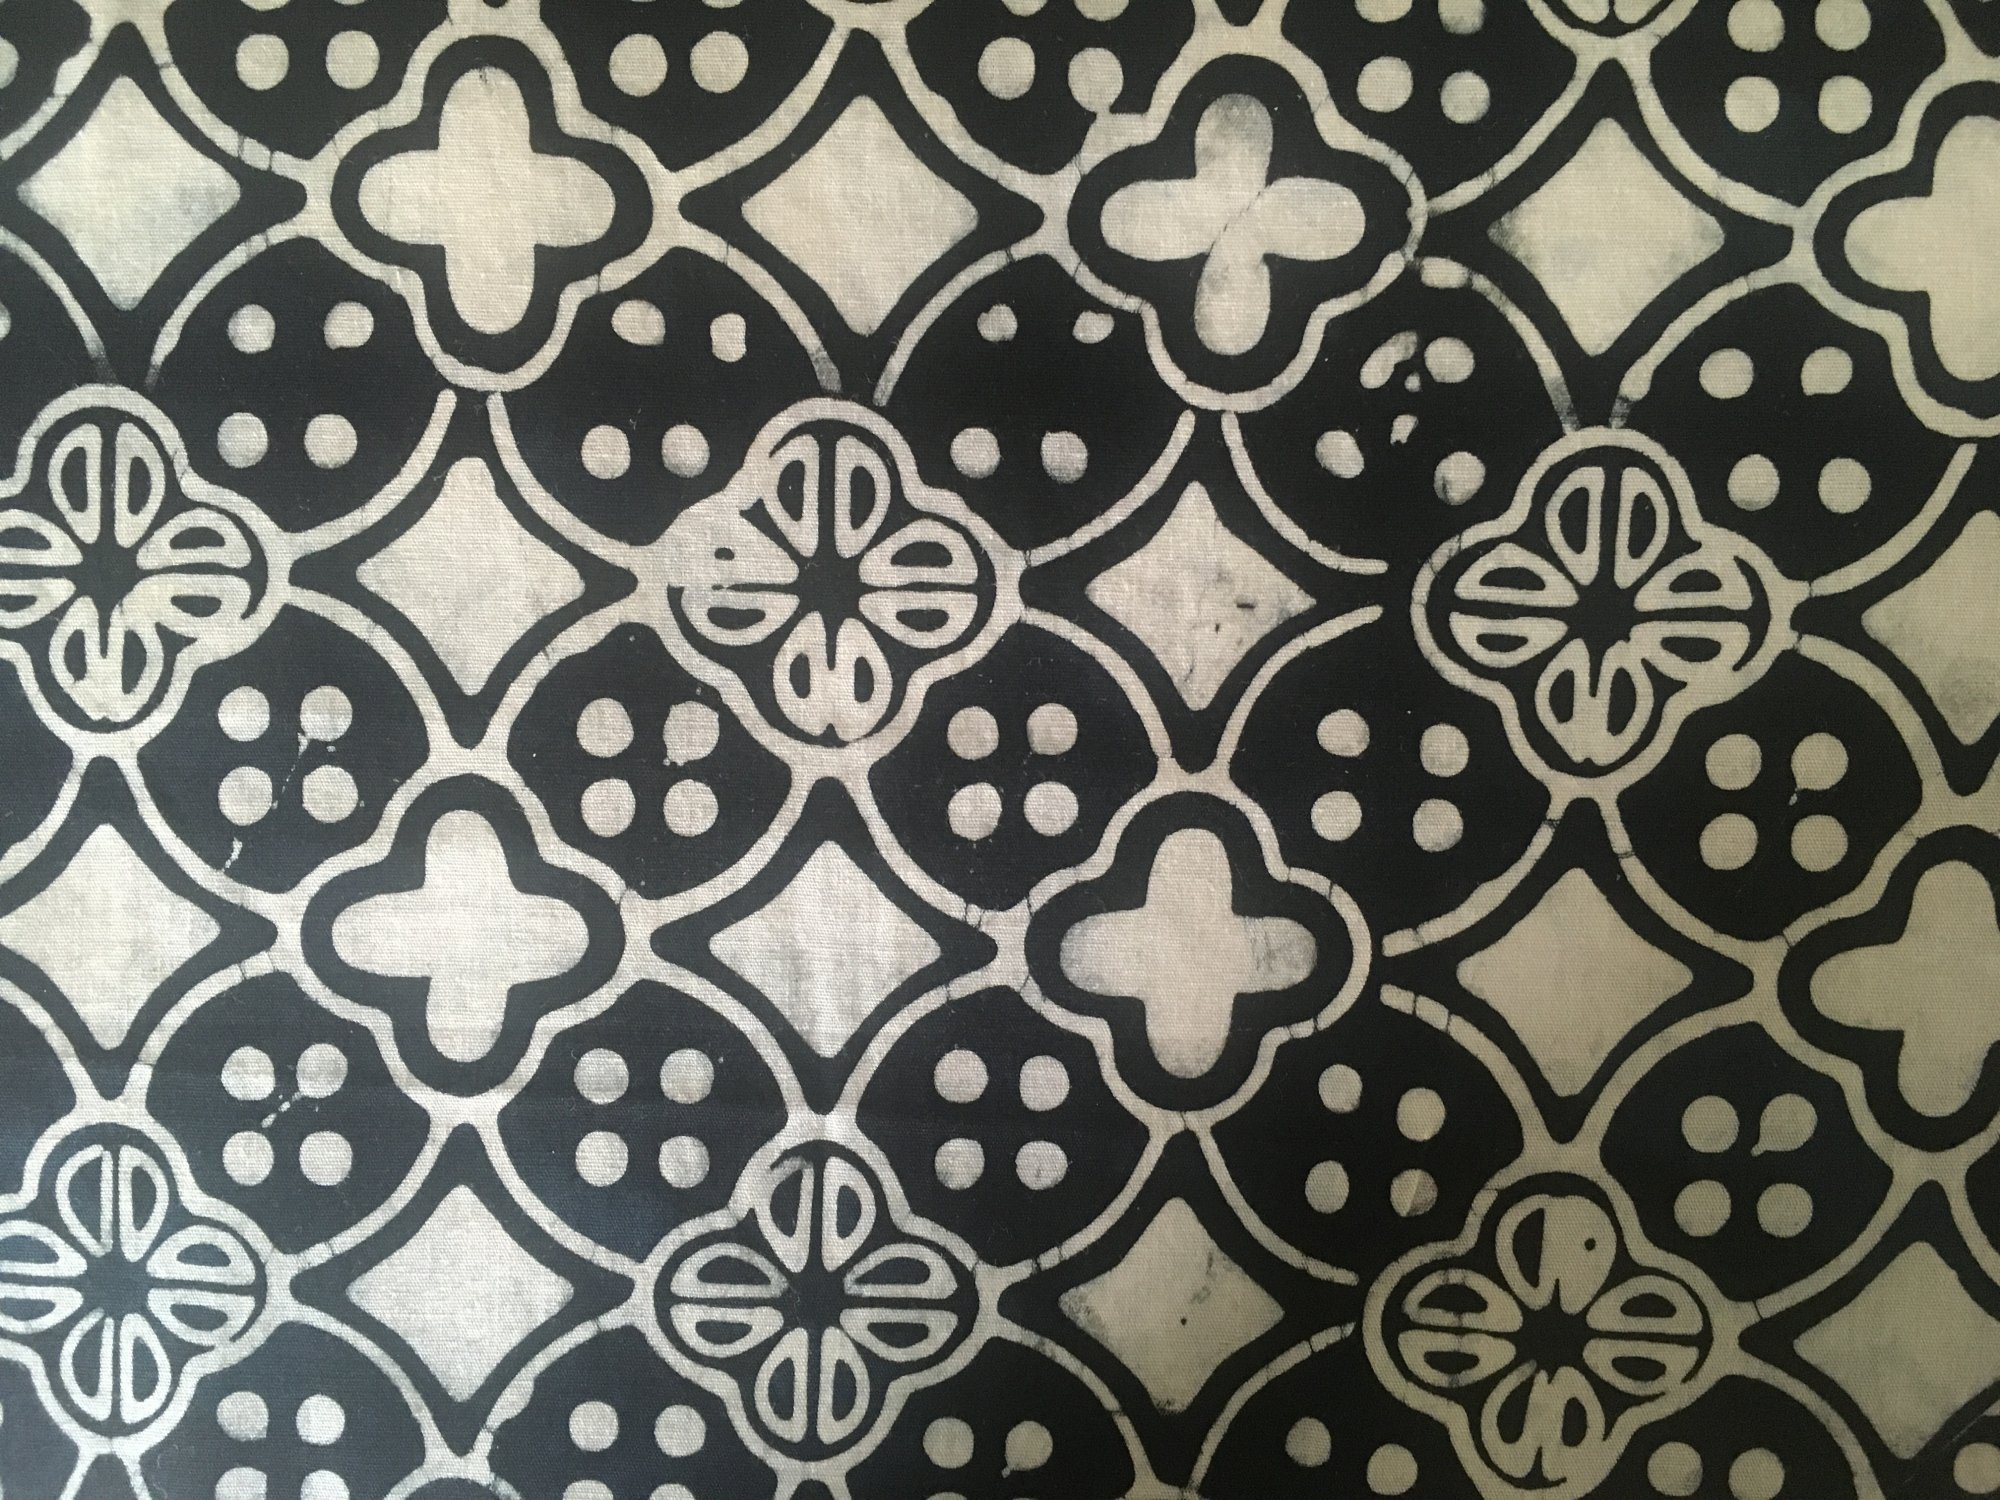 BATIK QUATREFOIL BLACK/WHITE 2005 Fabrics That Care